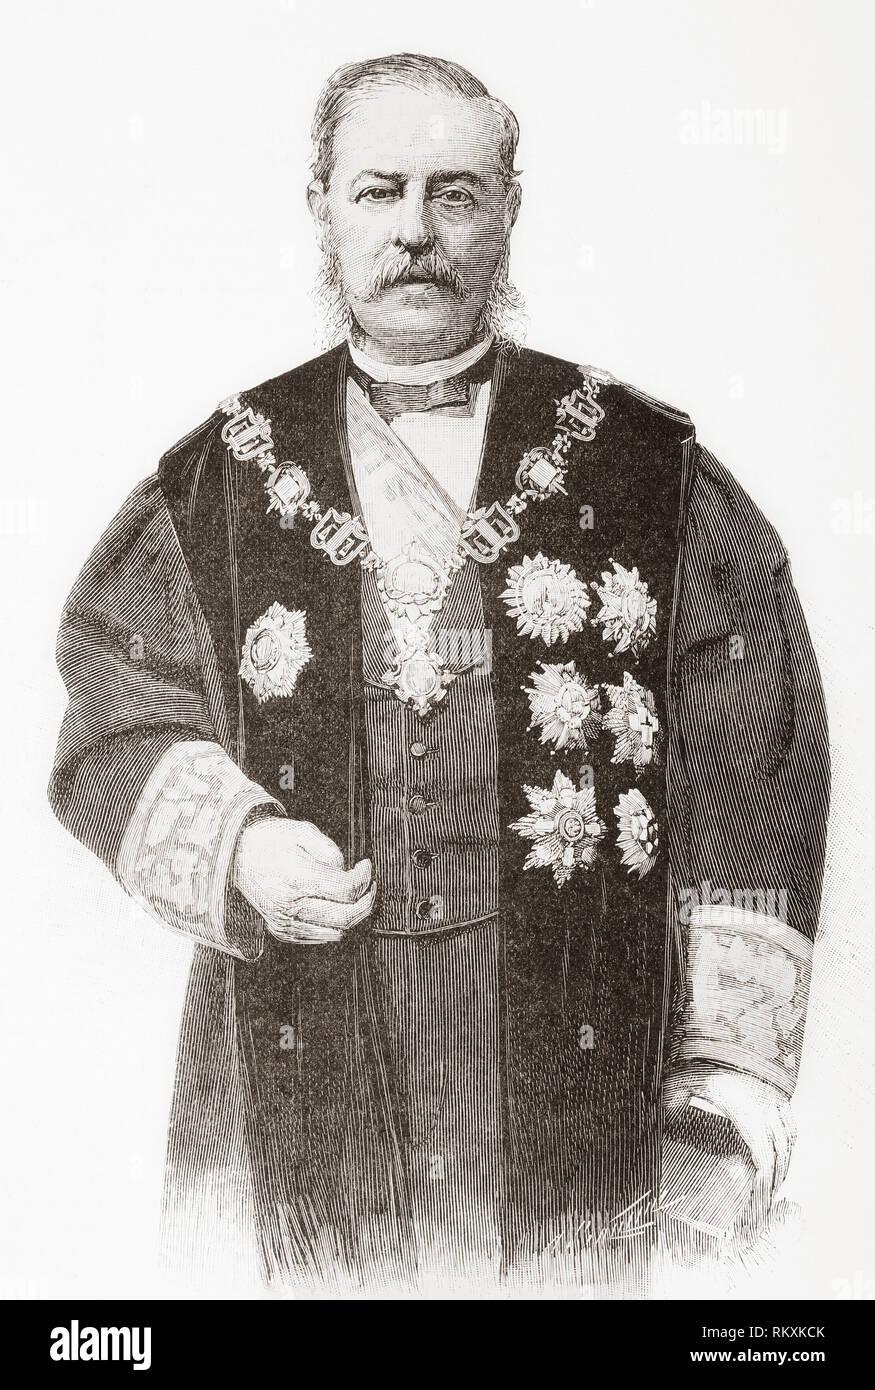 Emilio Bravo Romero, 1827 - 1893. Spanish marine, jurist and politician. - Stock Image